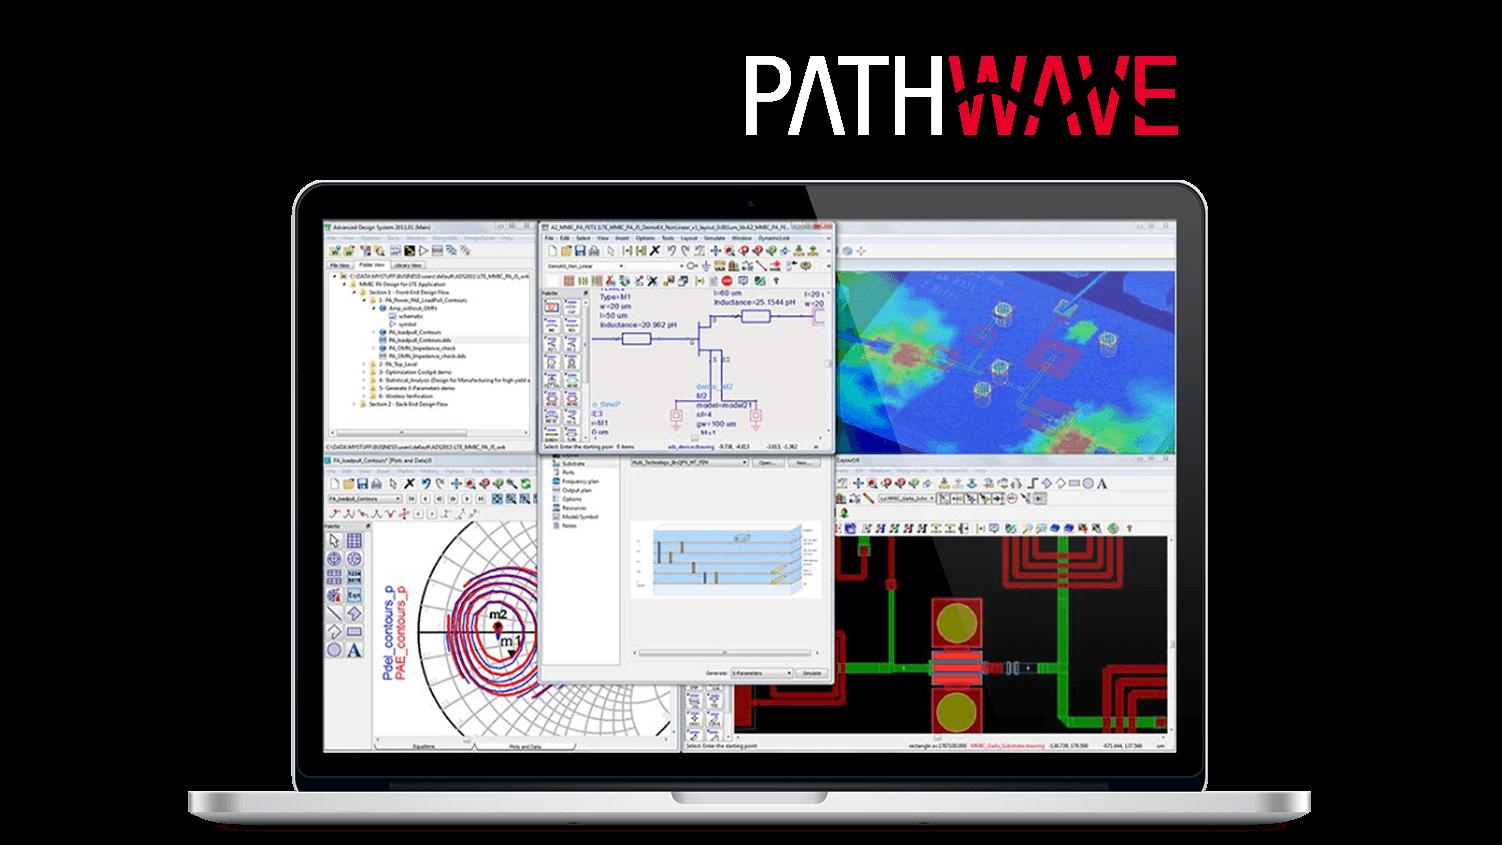 Pathwave Advanced Design System Ads Keysight